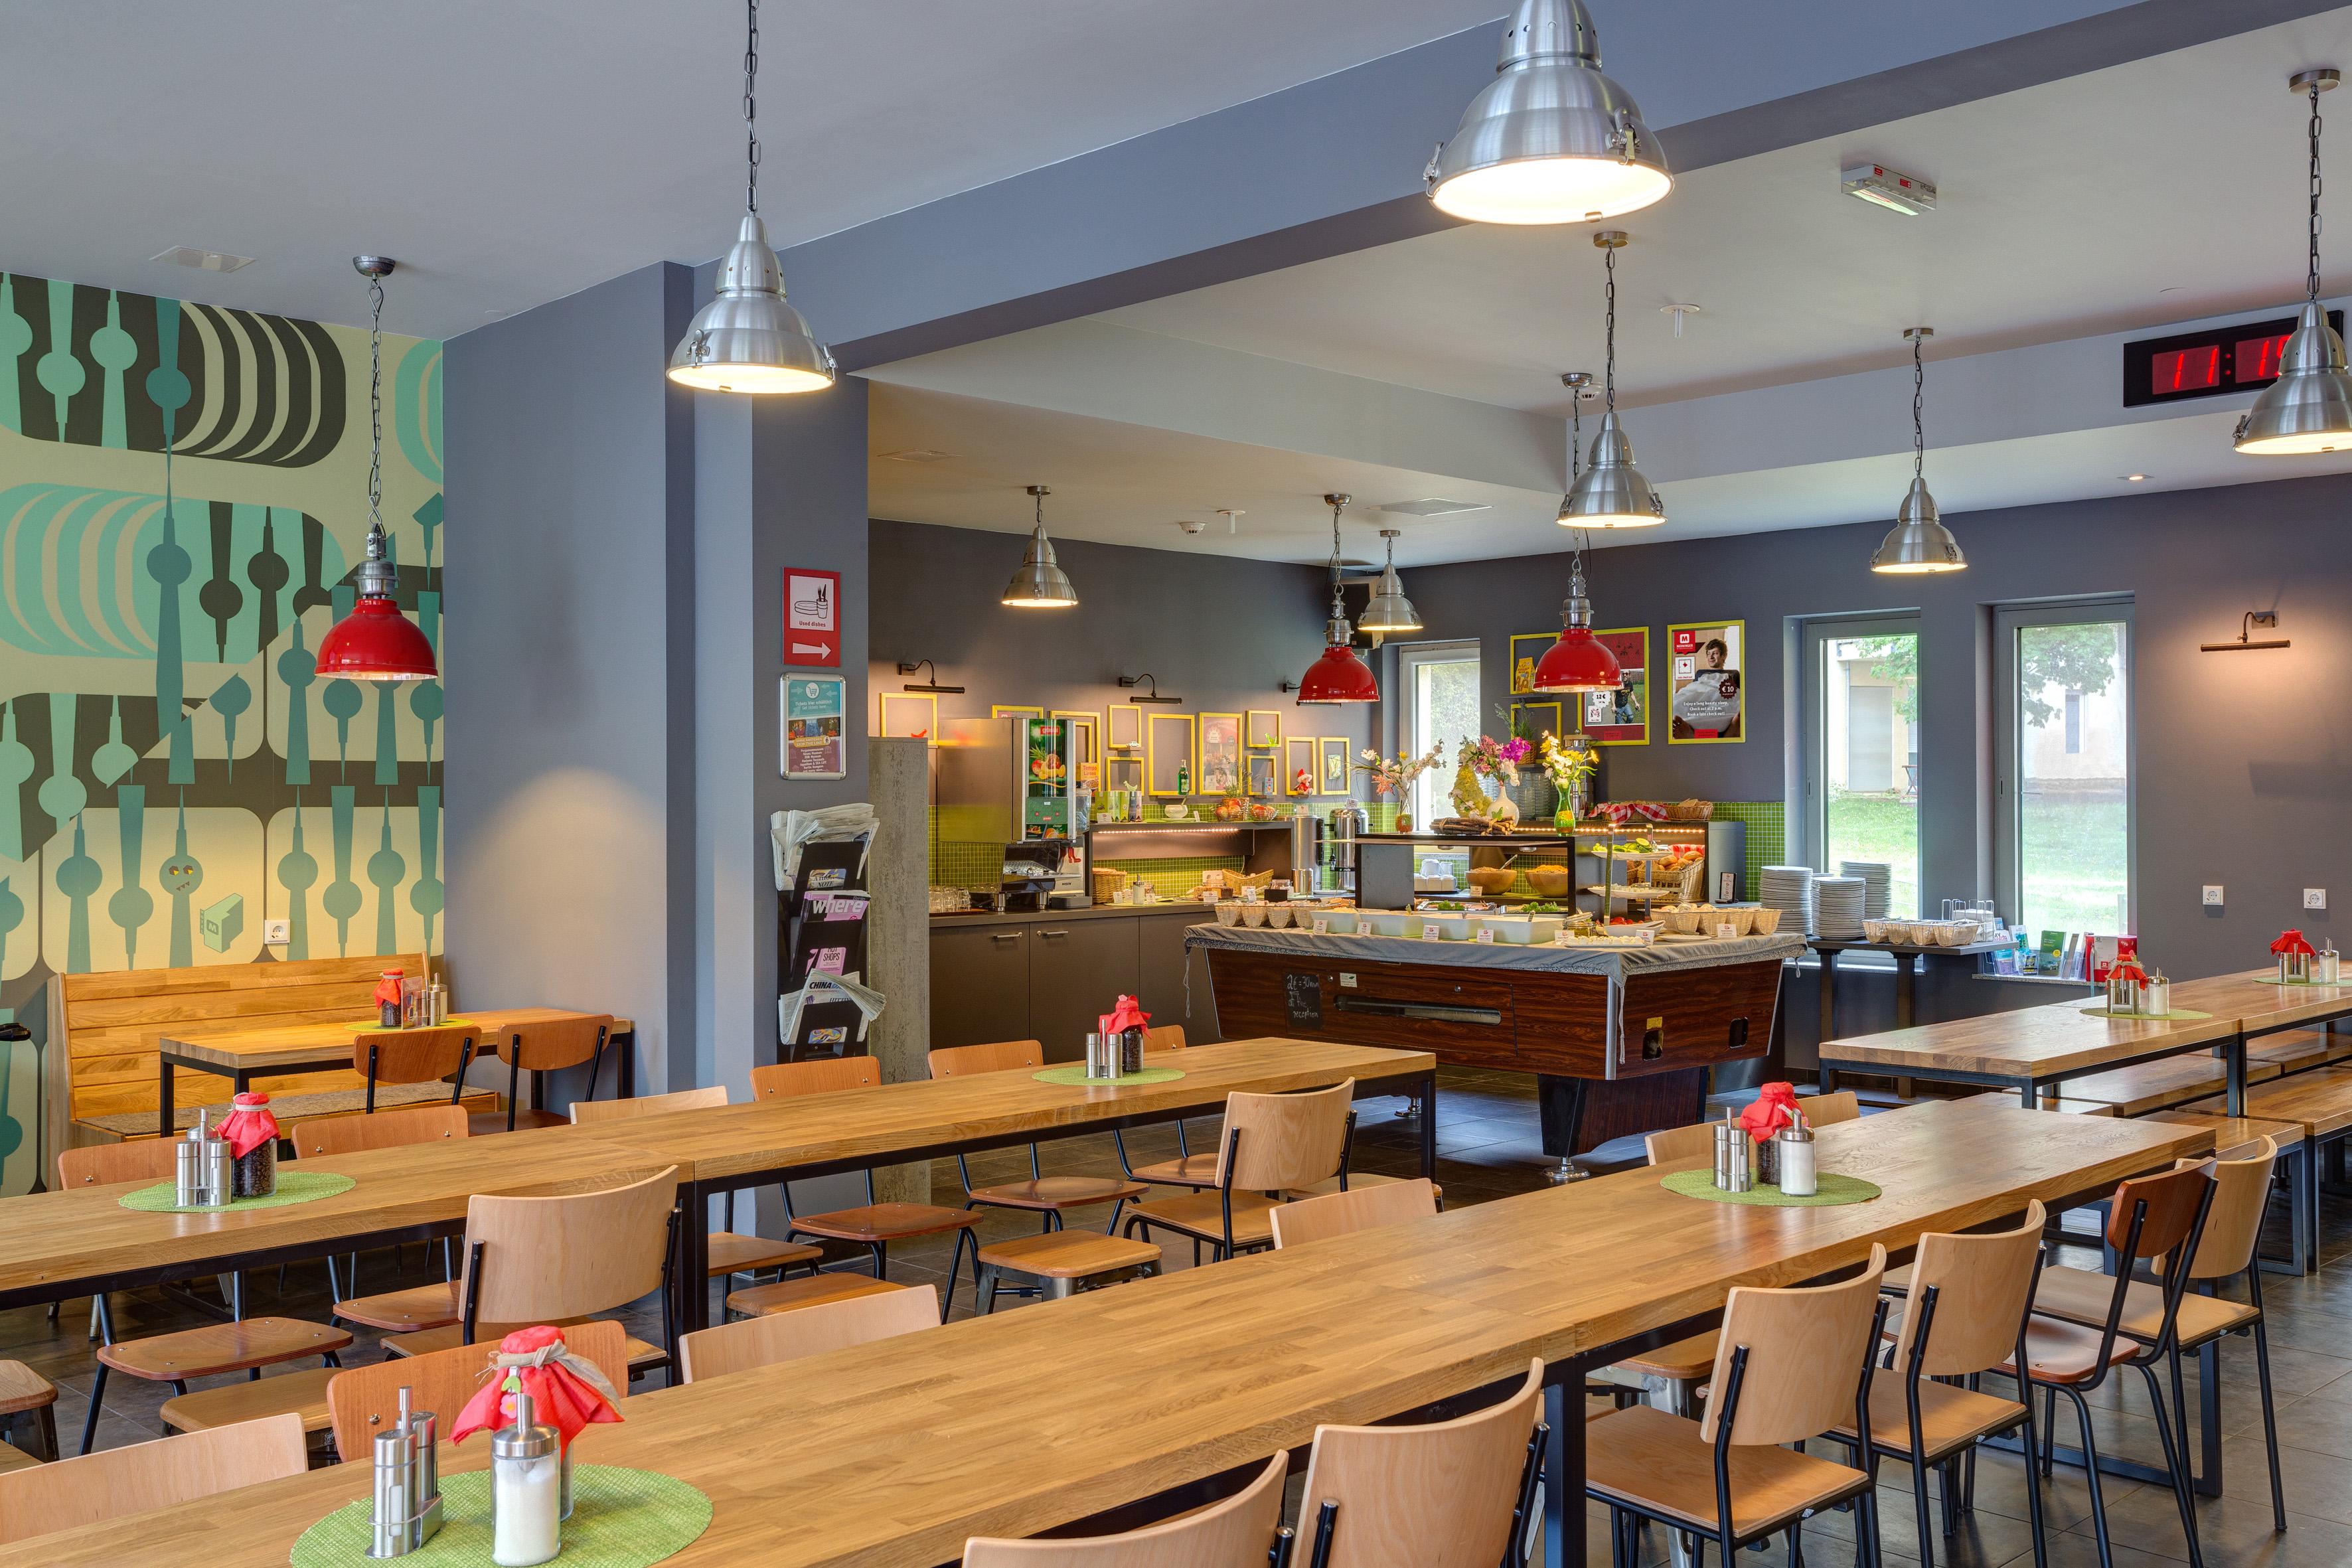 MEININGER Hotel Berlin Alexanderplatz - Breakfast room/ Buffet